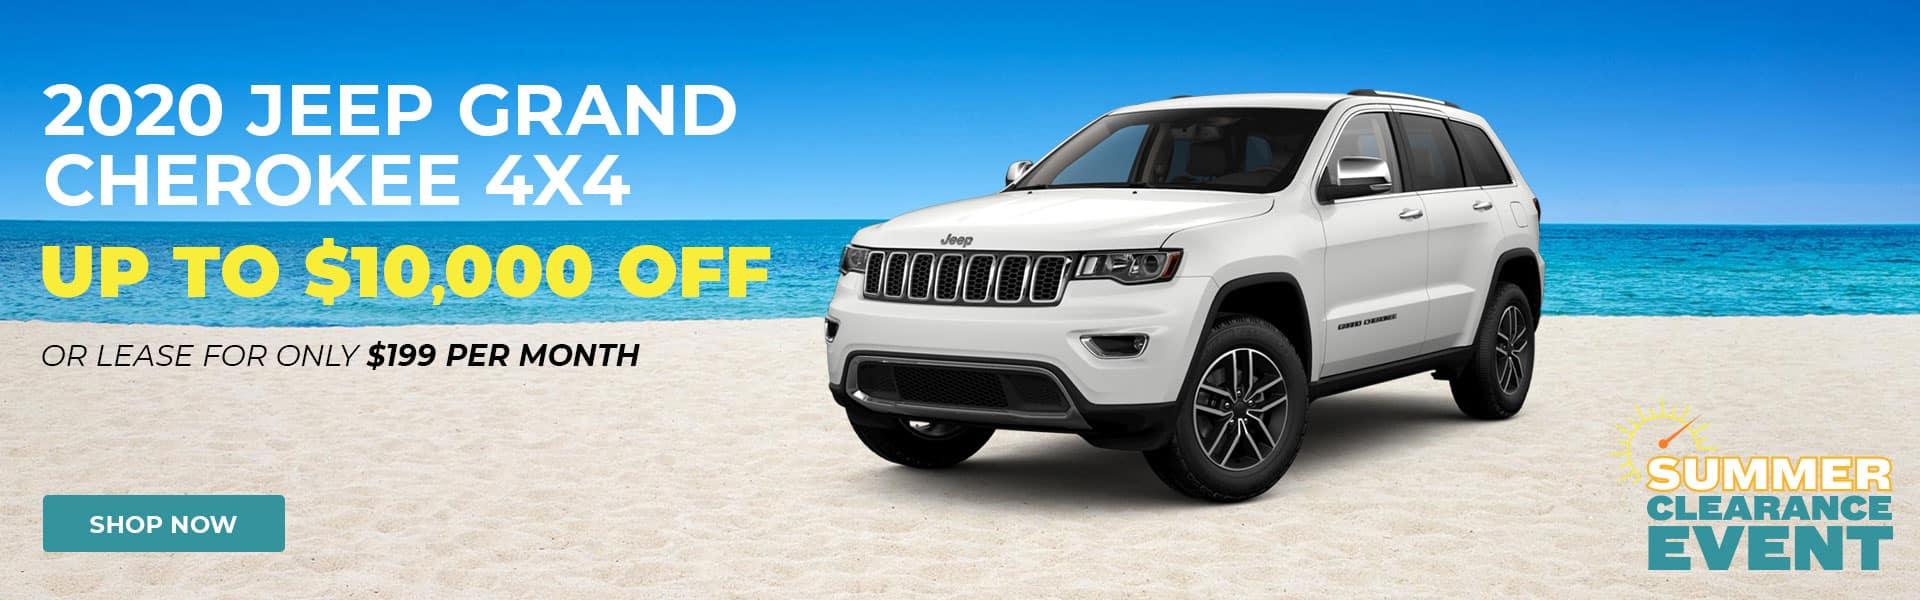 Summer Sale Jeep Cherokee